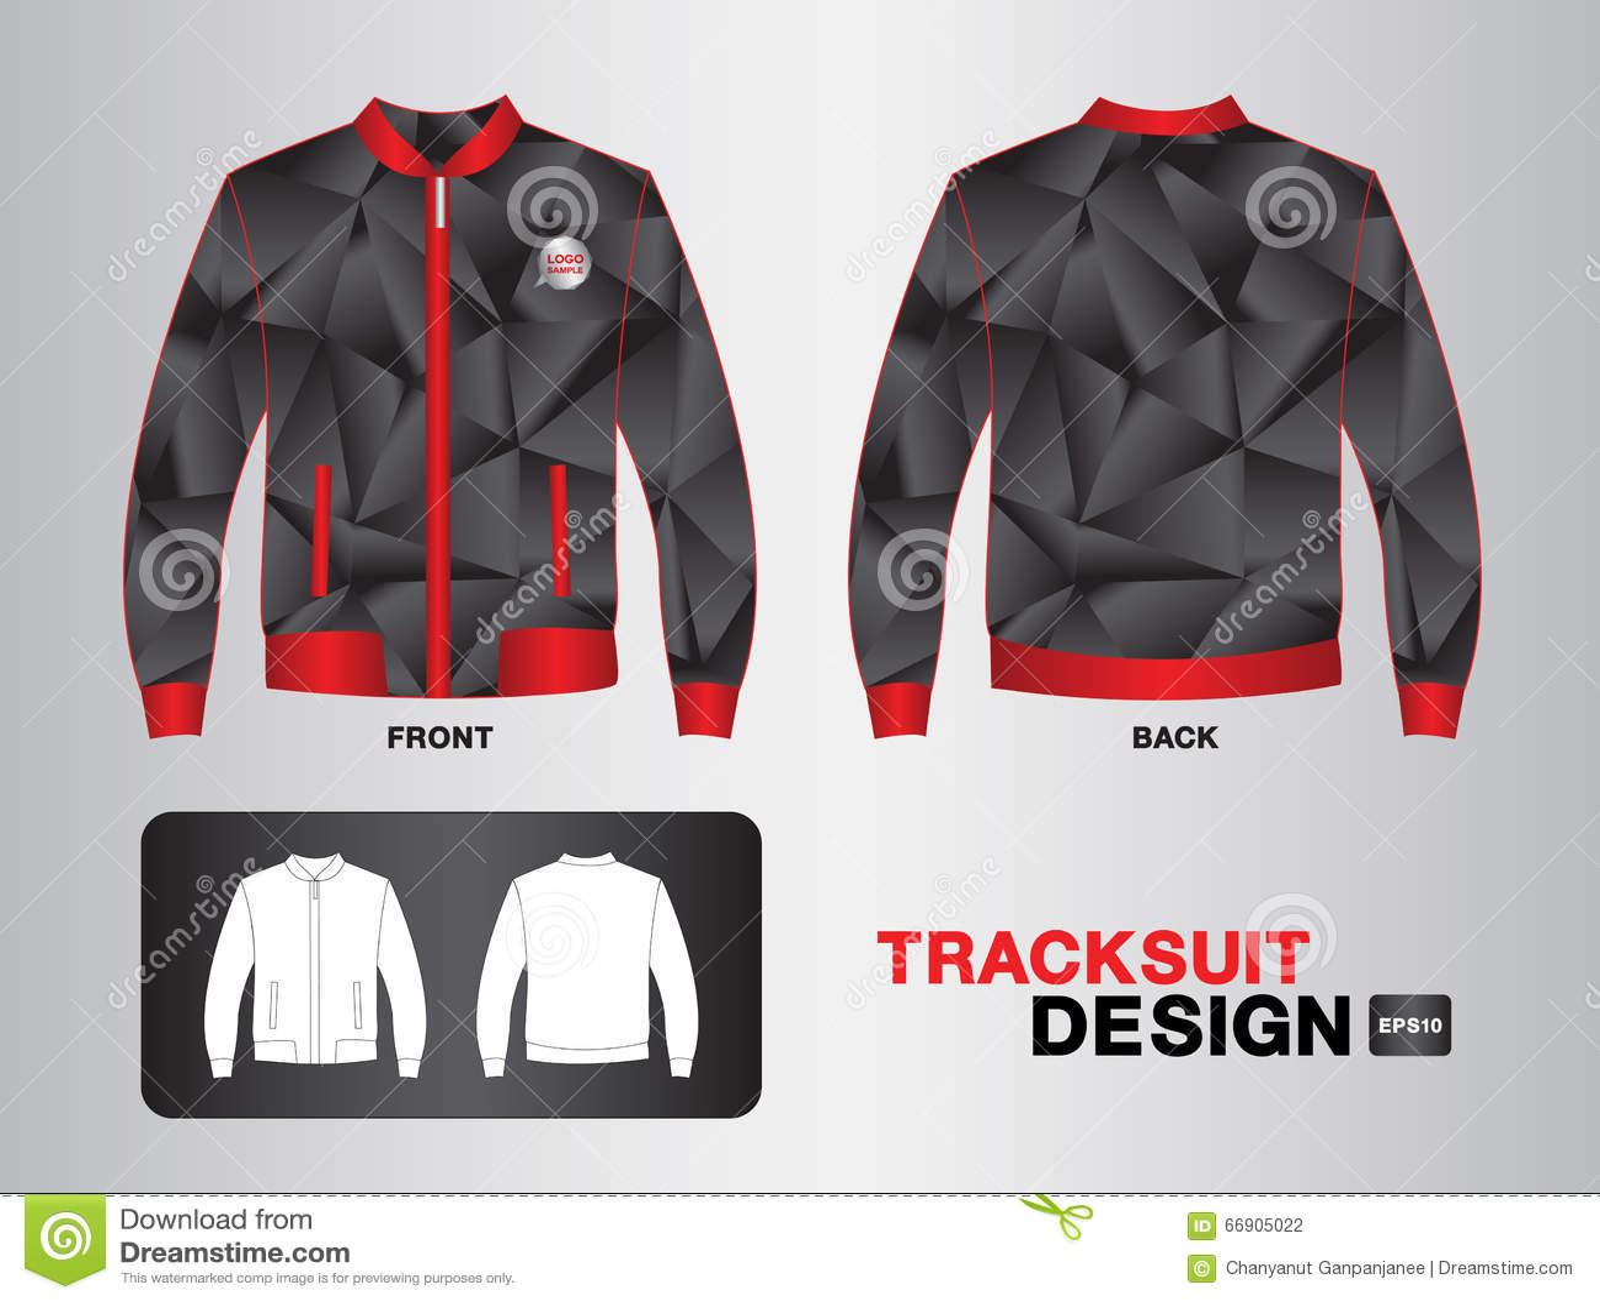 Shirt uniform design vector - Red And Black Tracksuit Design Vector Illustration Jacket Design Stock Photography